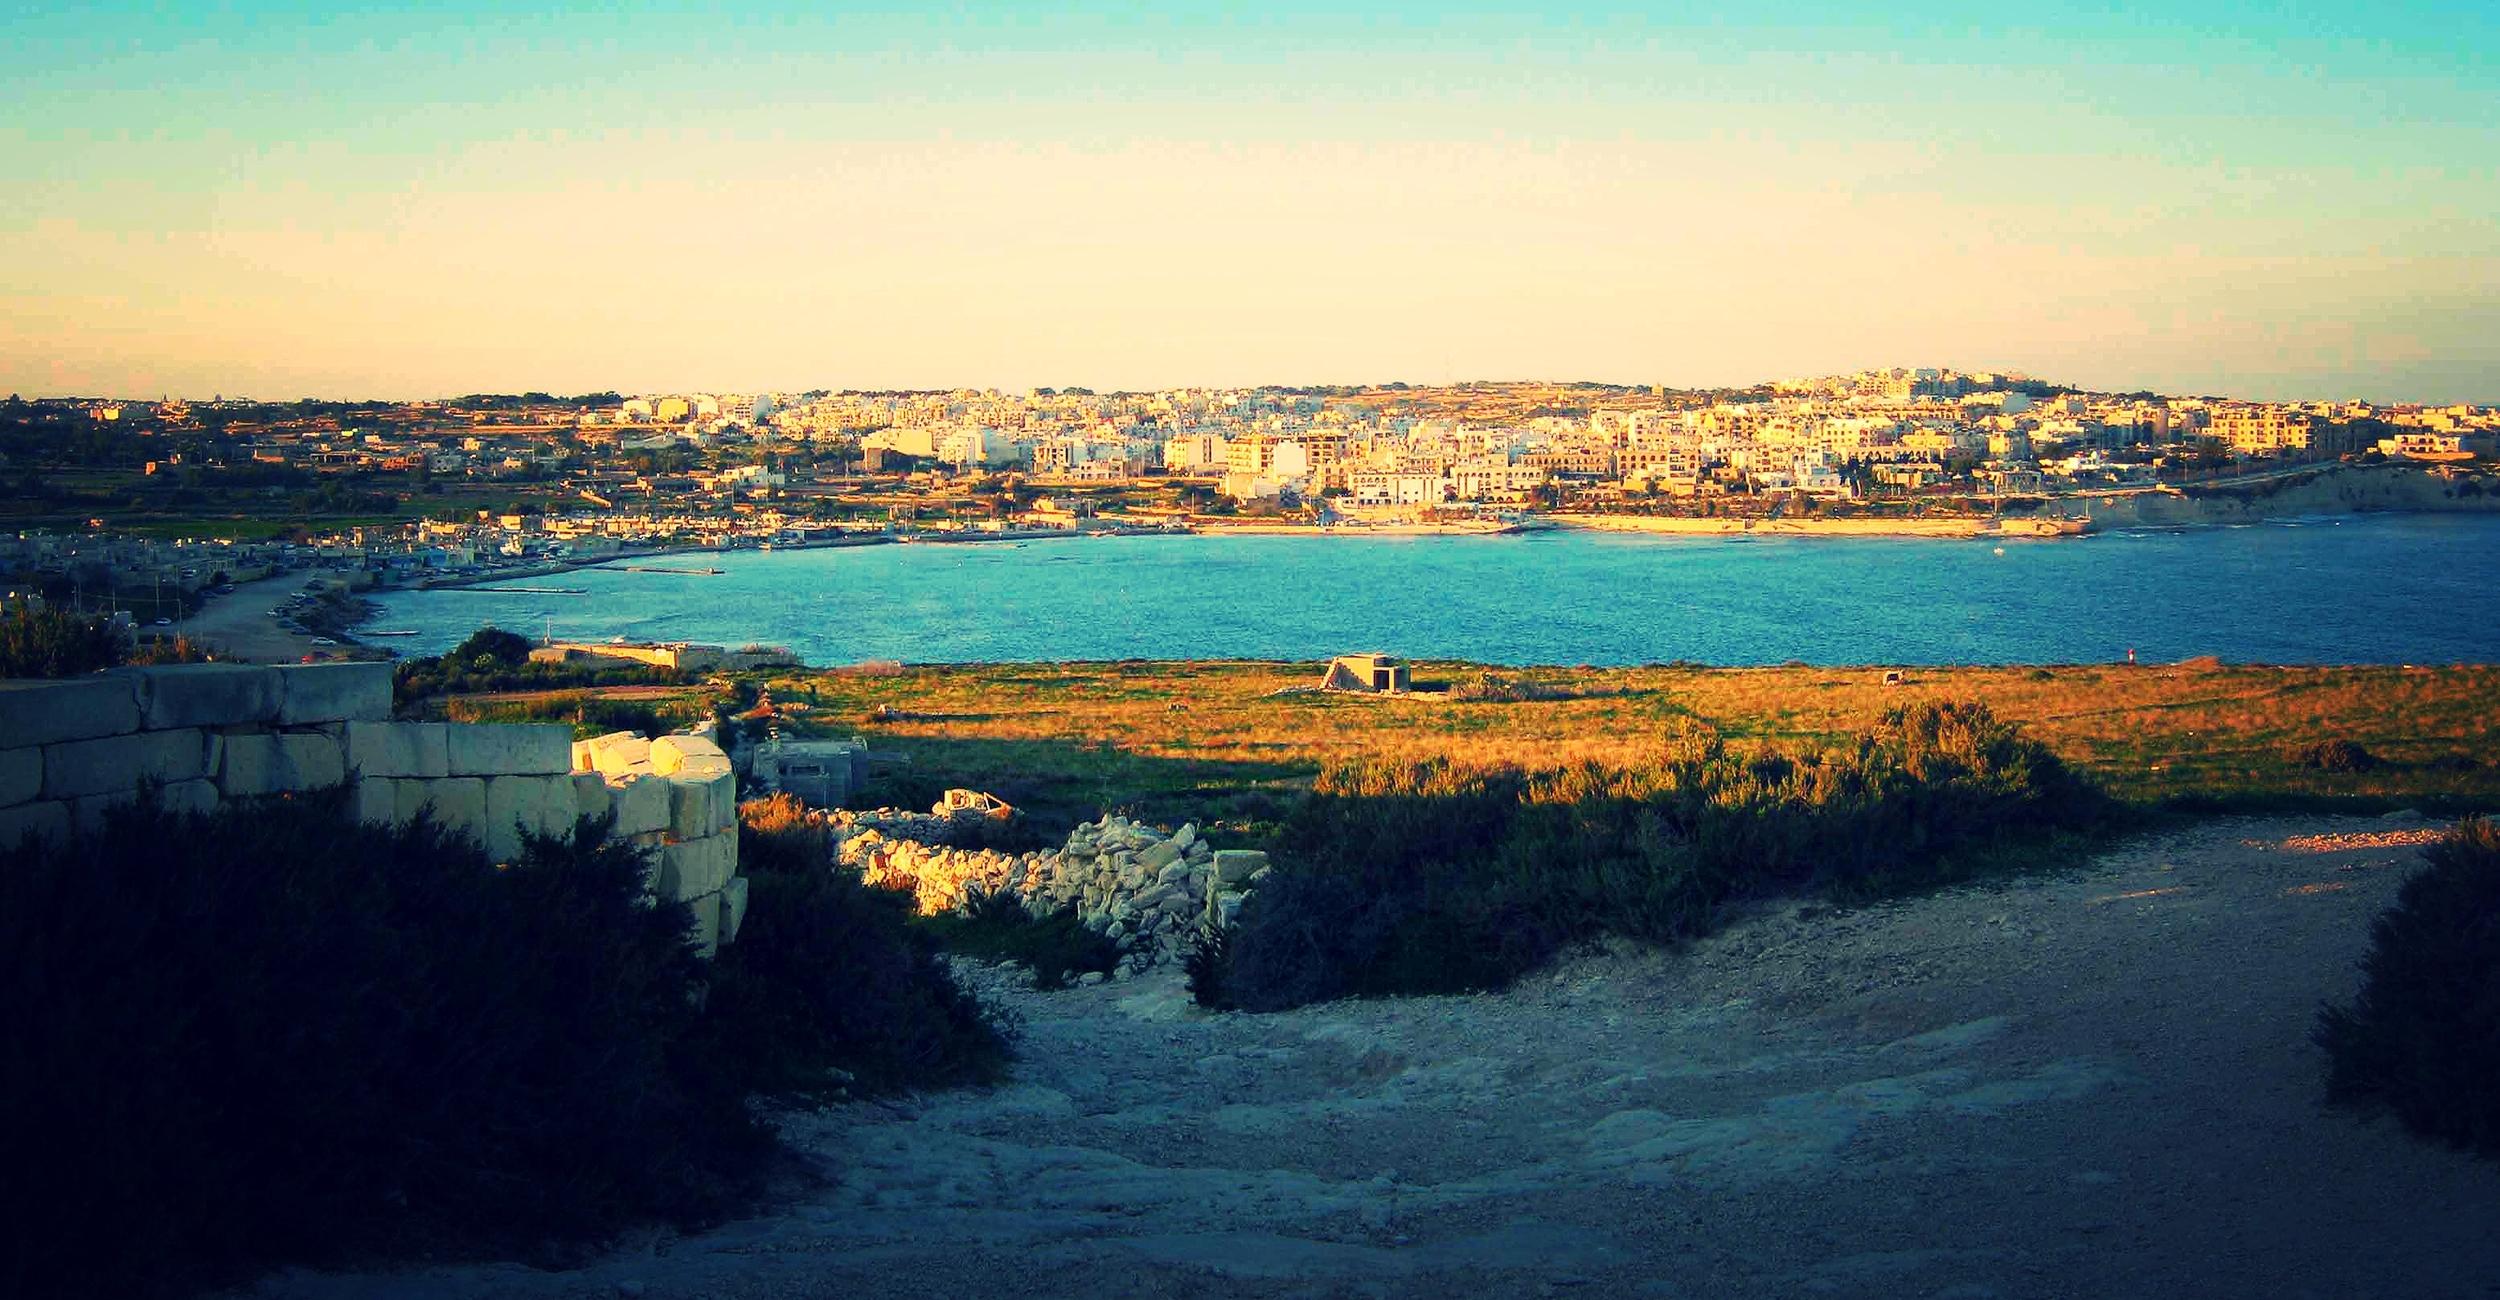 Malta-St-Thomas's-Bay.jpg